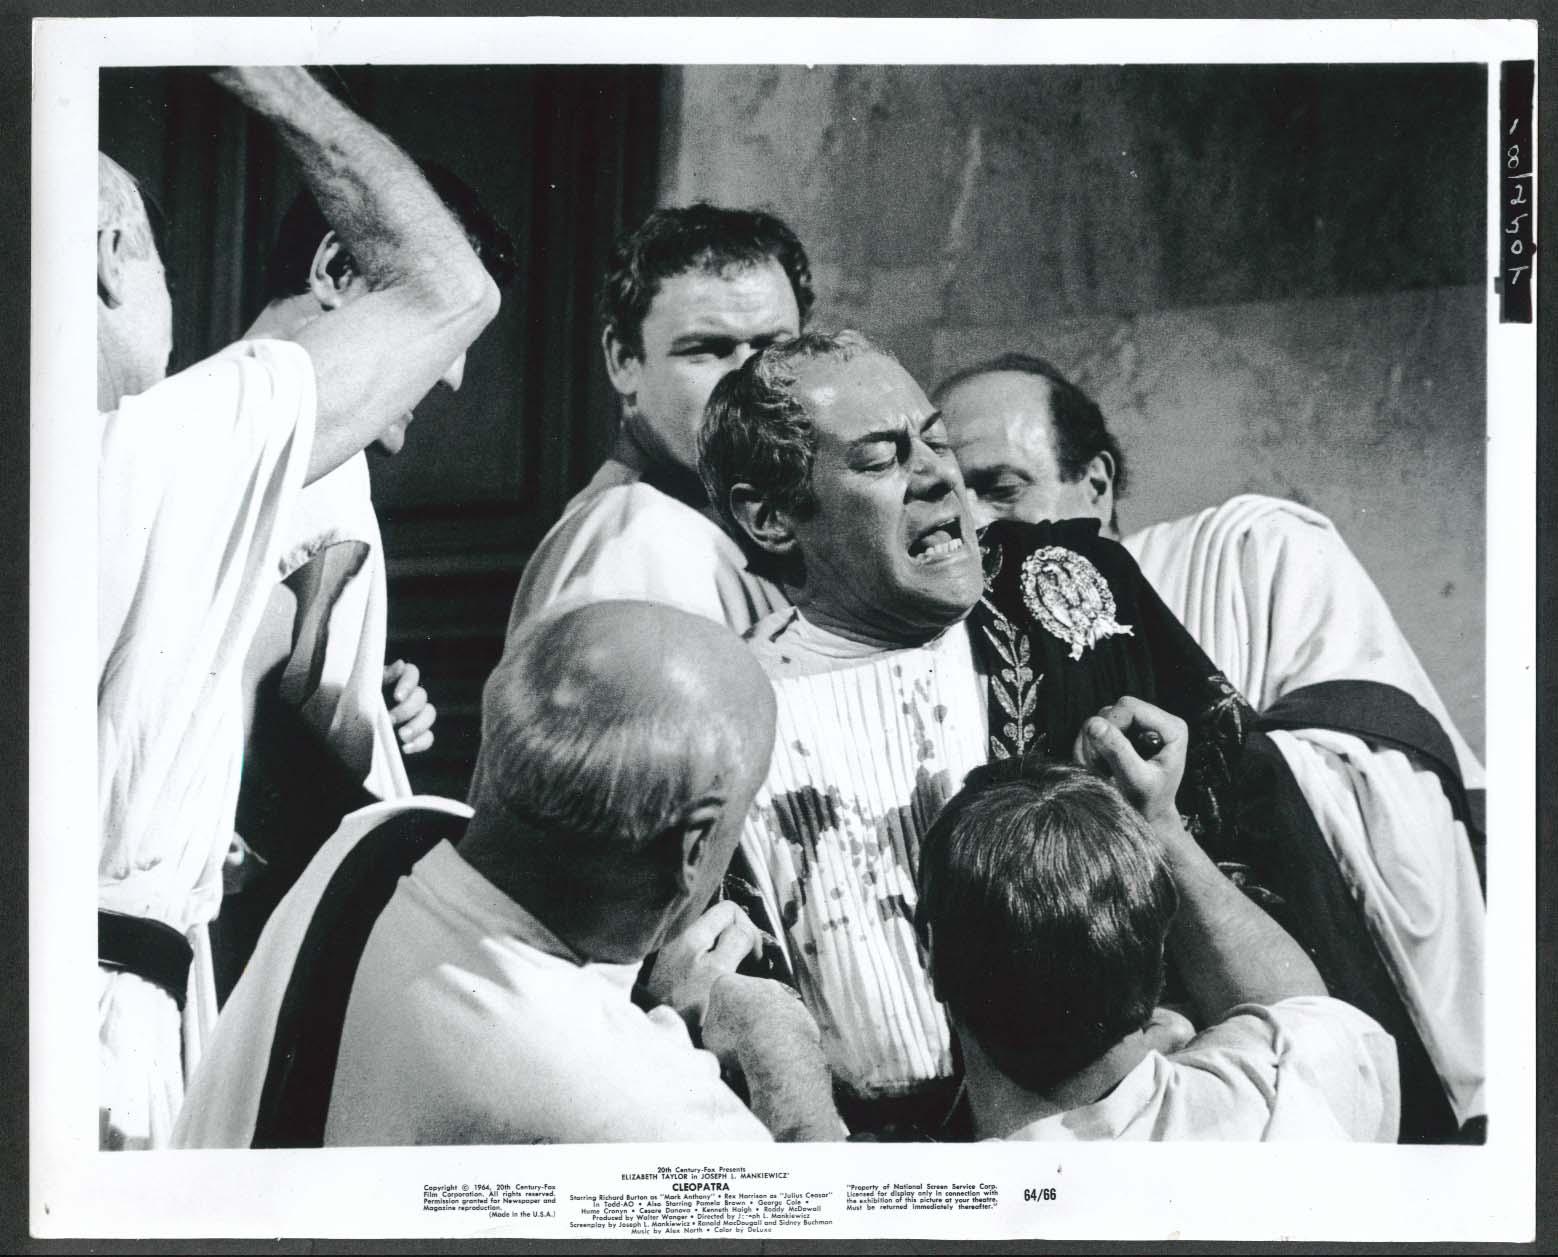 Image for Rex Harrison Cleopatra Caesar murder scene 8x10 photograph 1964